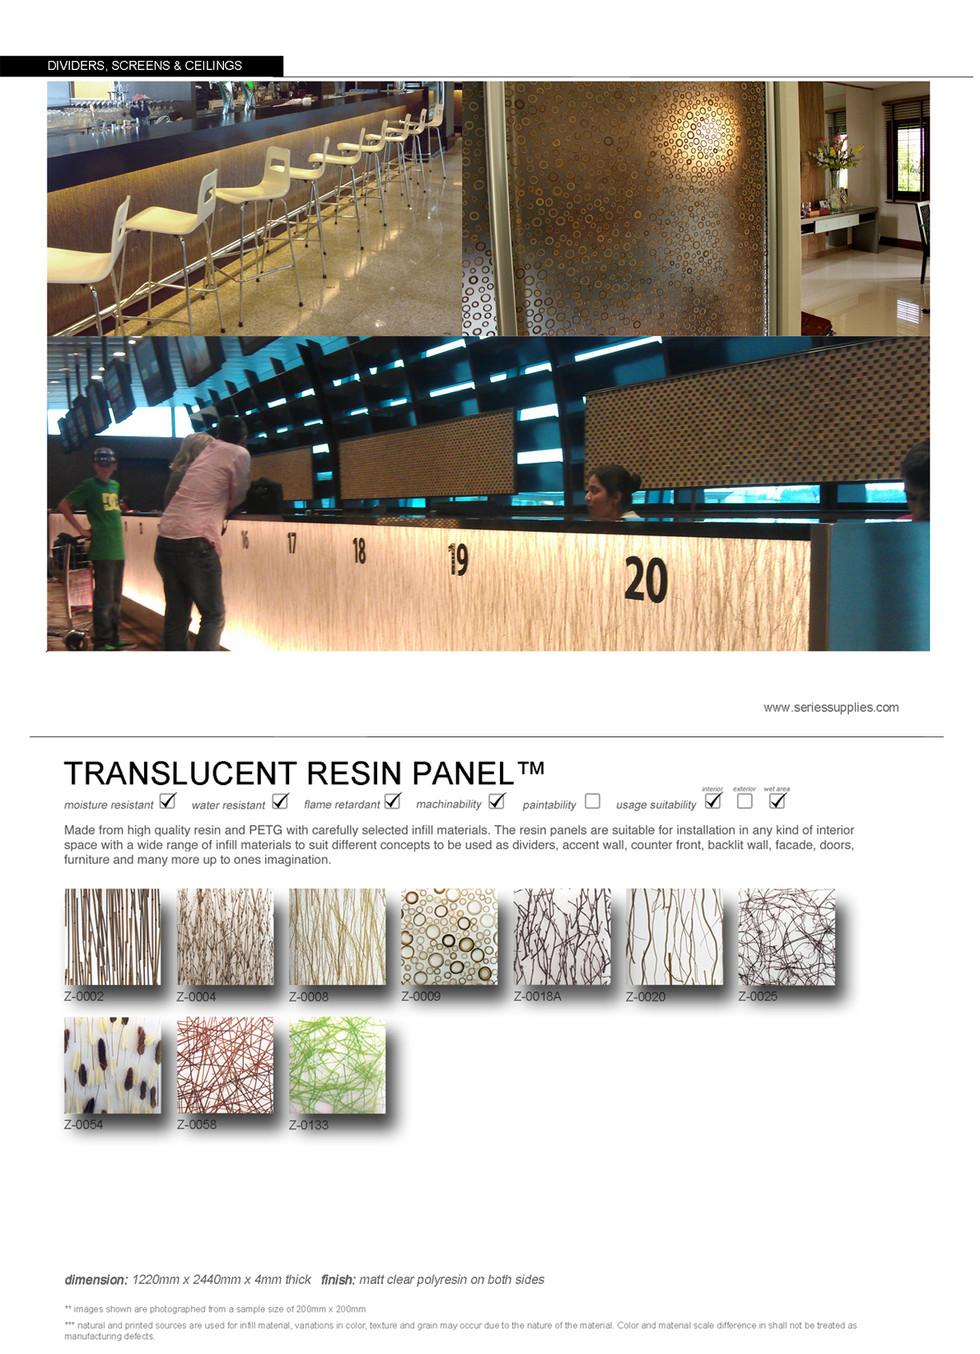 Translucent Screen Panel